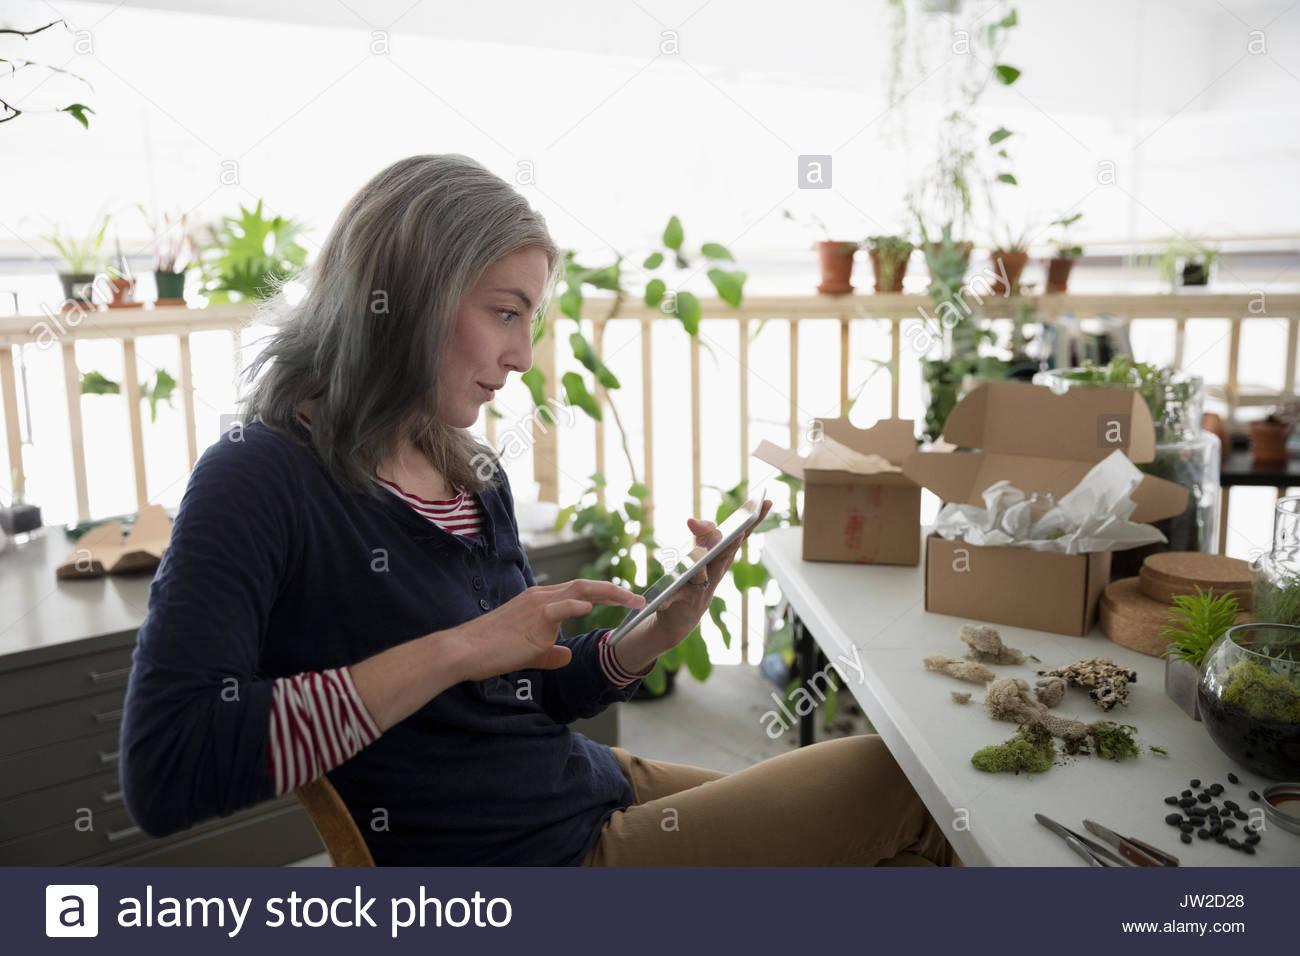 Female shop owner using digital tablet, making succulent plant terrariums - Stock Image